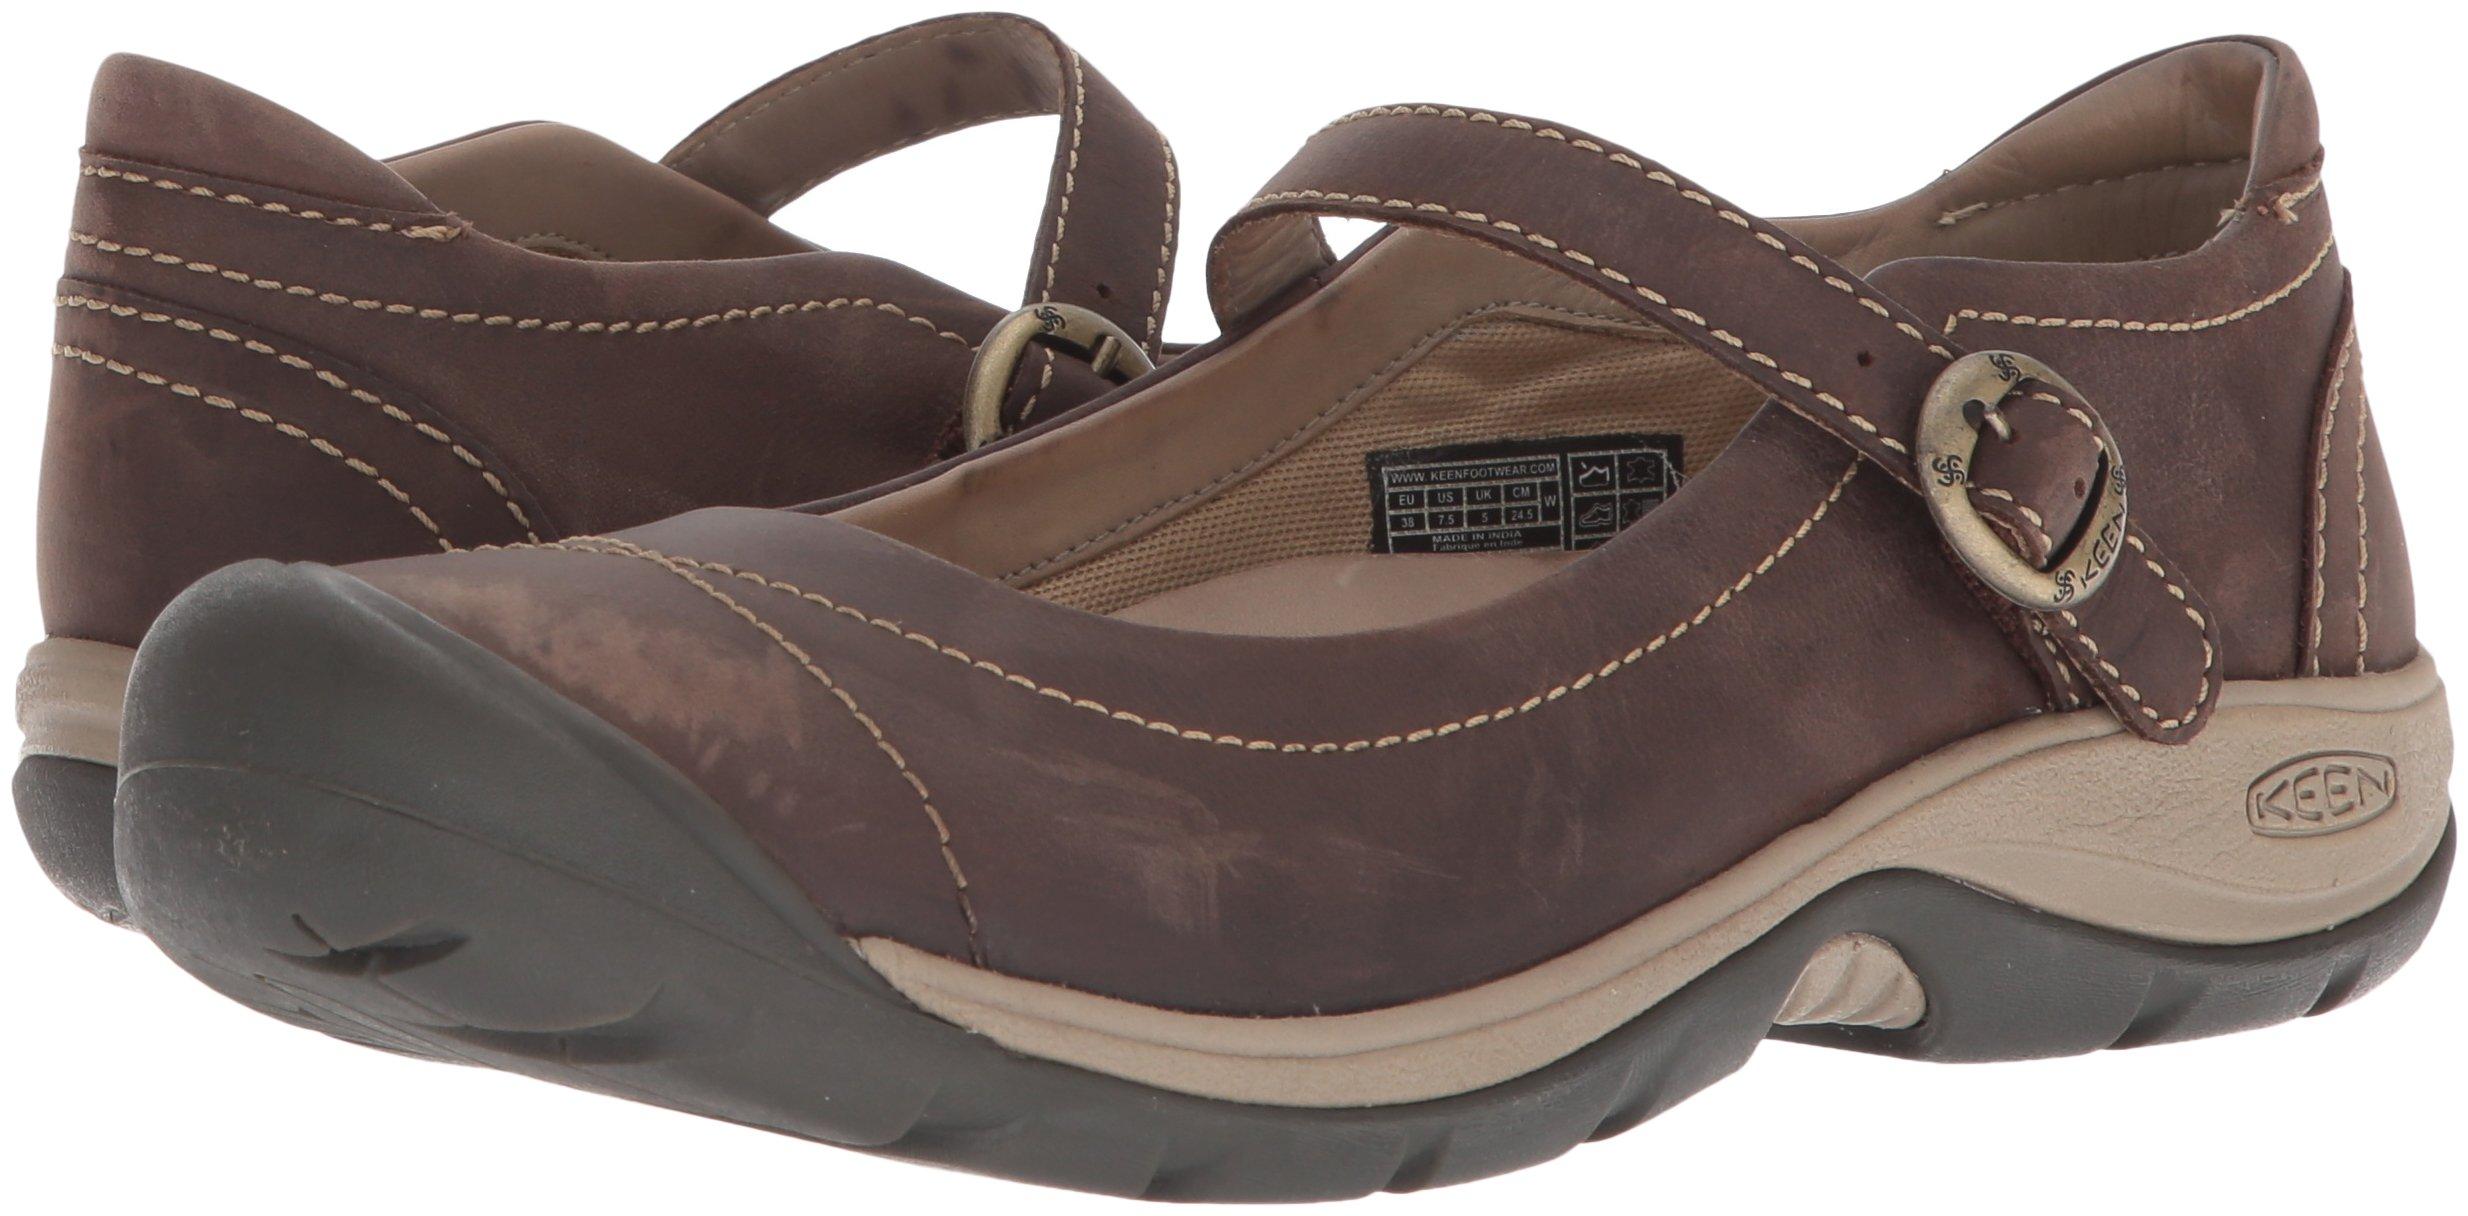 KEEN Women's Presidio II MJ-W Hiking Shoe, Infield/Cornstalk, 8.5 M US 5